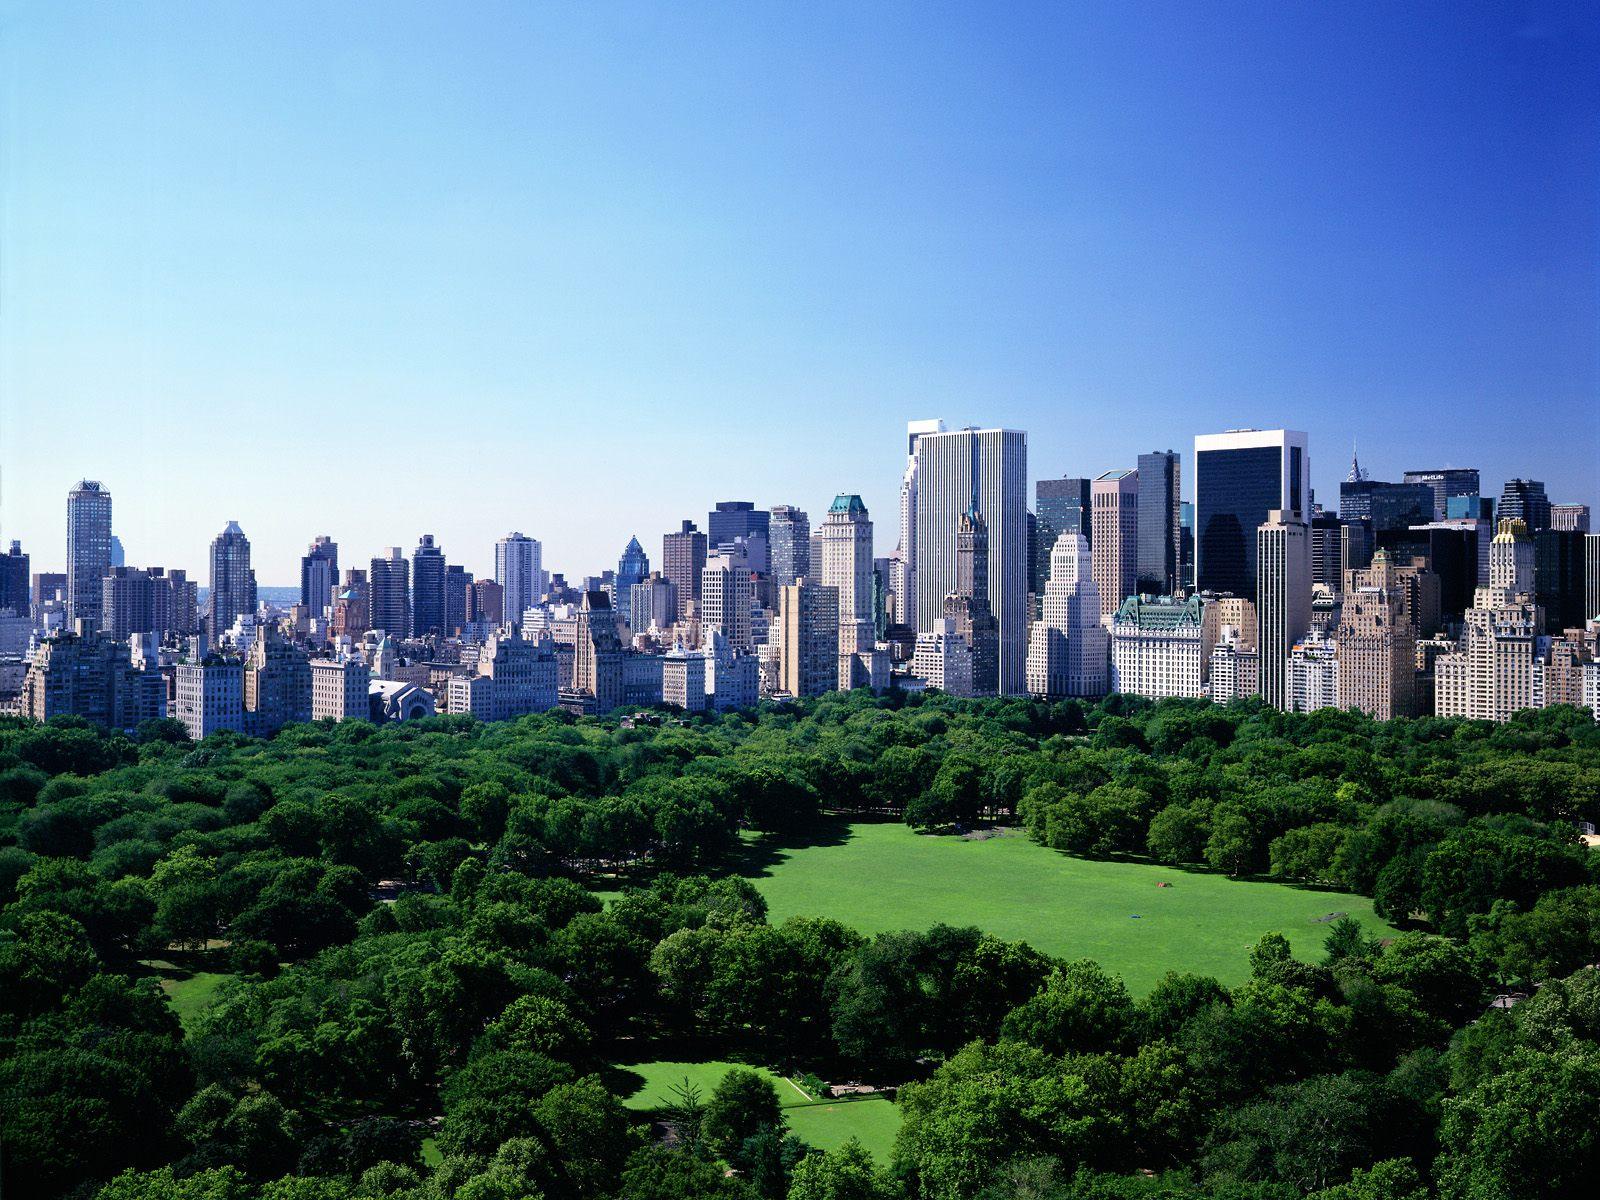 La Mia Città Ideale Test in quale città dovresti vivere? [test] | pourfemme